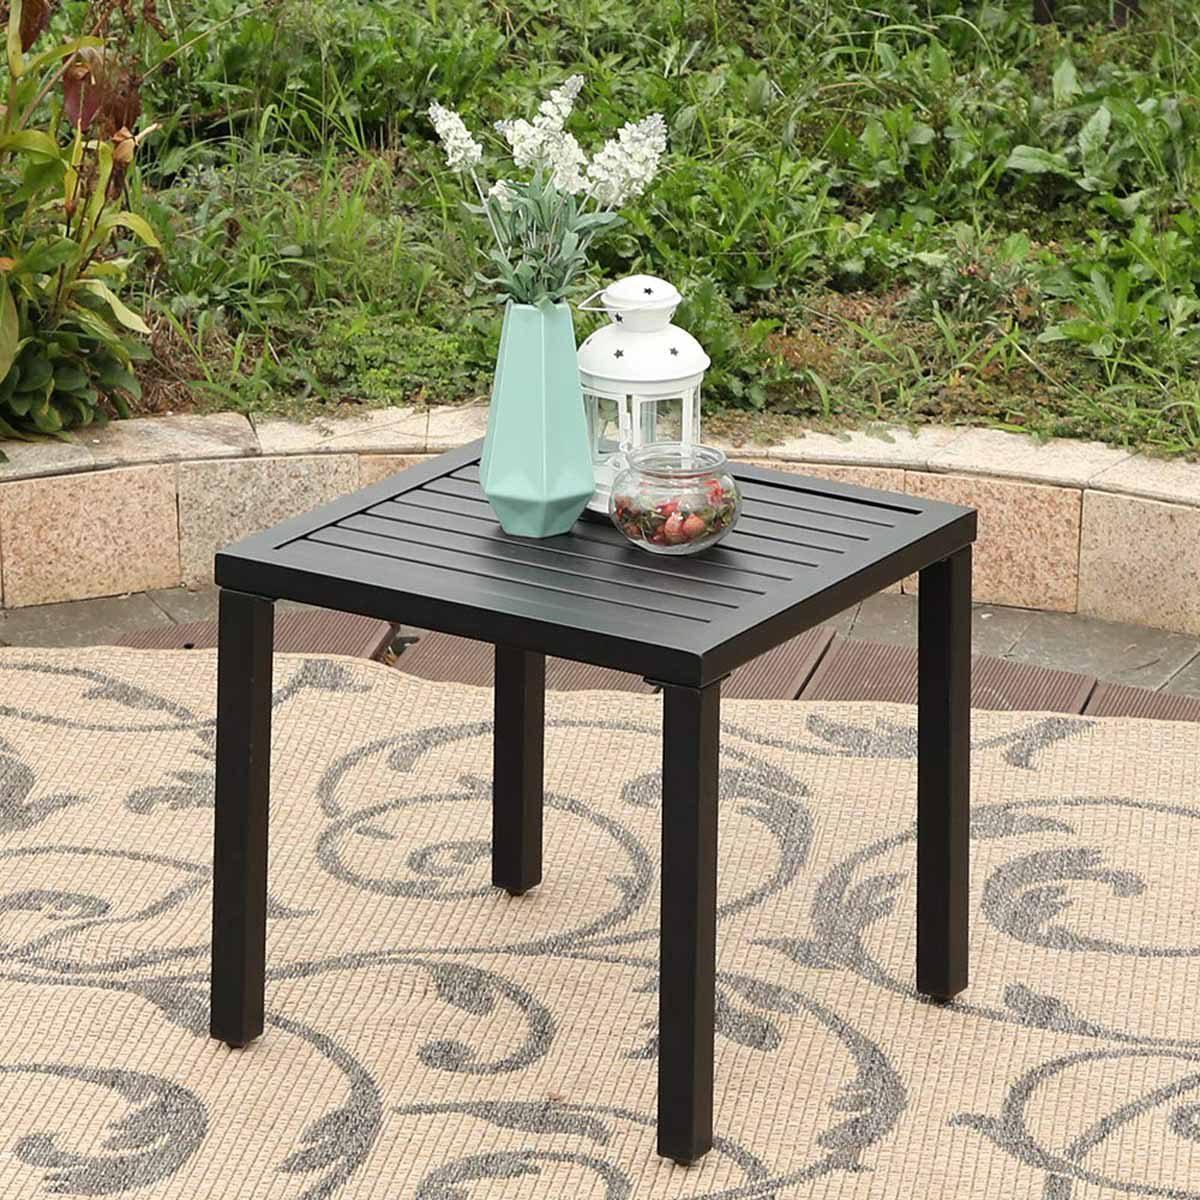 PHI-VILLA-Indoor-Outdoor-Small-Metal-Square-Side_End-Table-Patio-Coffee-Bistro-Black-Table